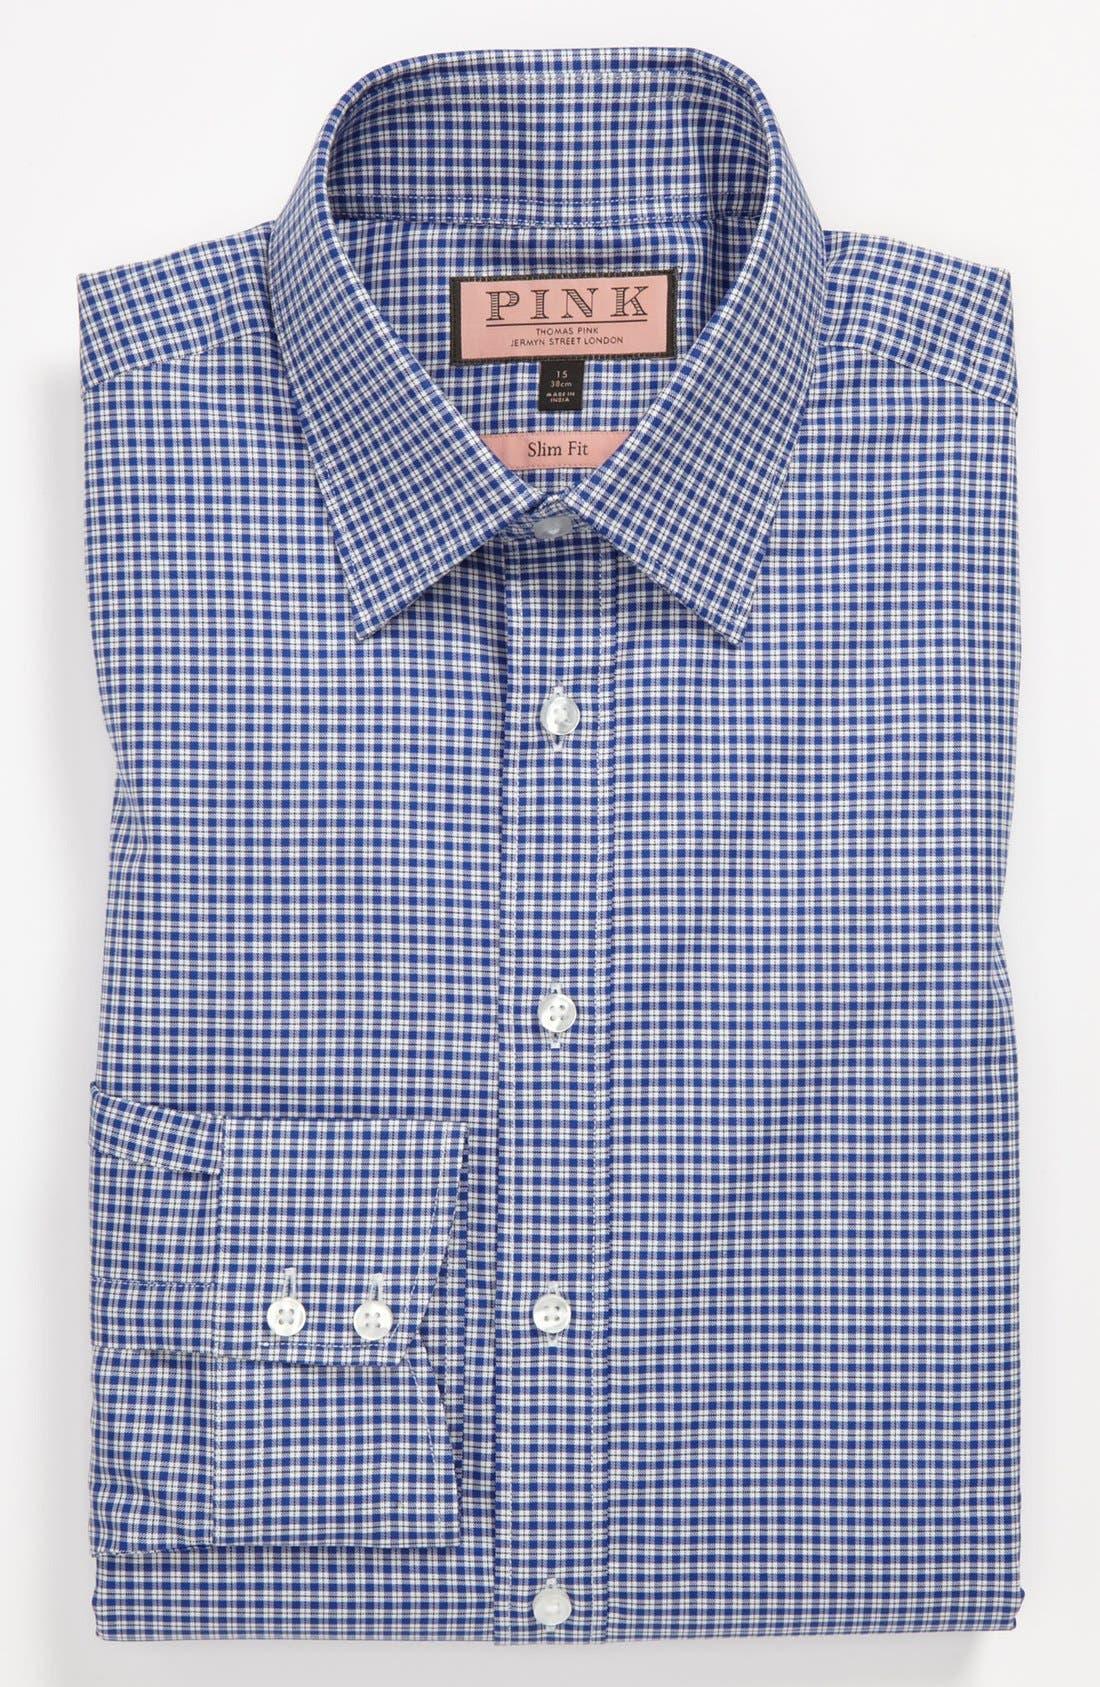 Alternate Image 1 Selected - Thomas Pink Slim Fit Dress Shirt